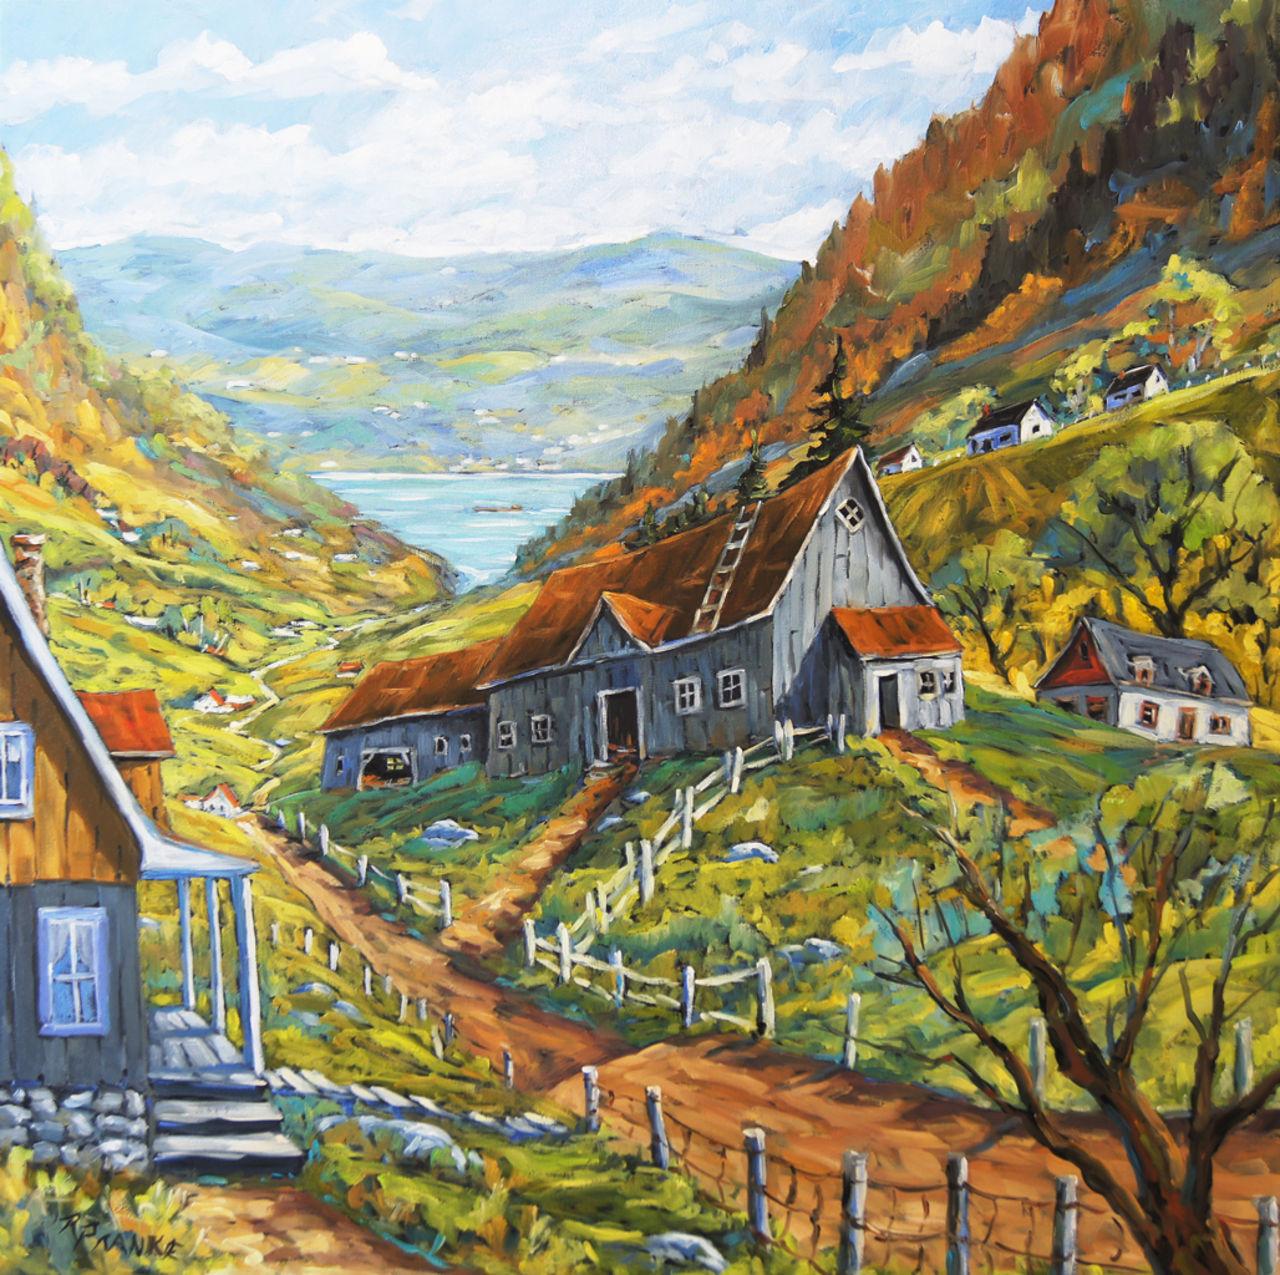 Richard T Pranke Vue de vallée à Charlevoix grande toile à l'huile